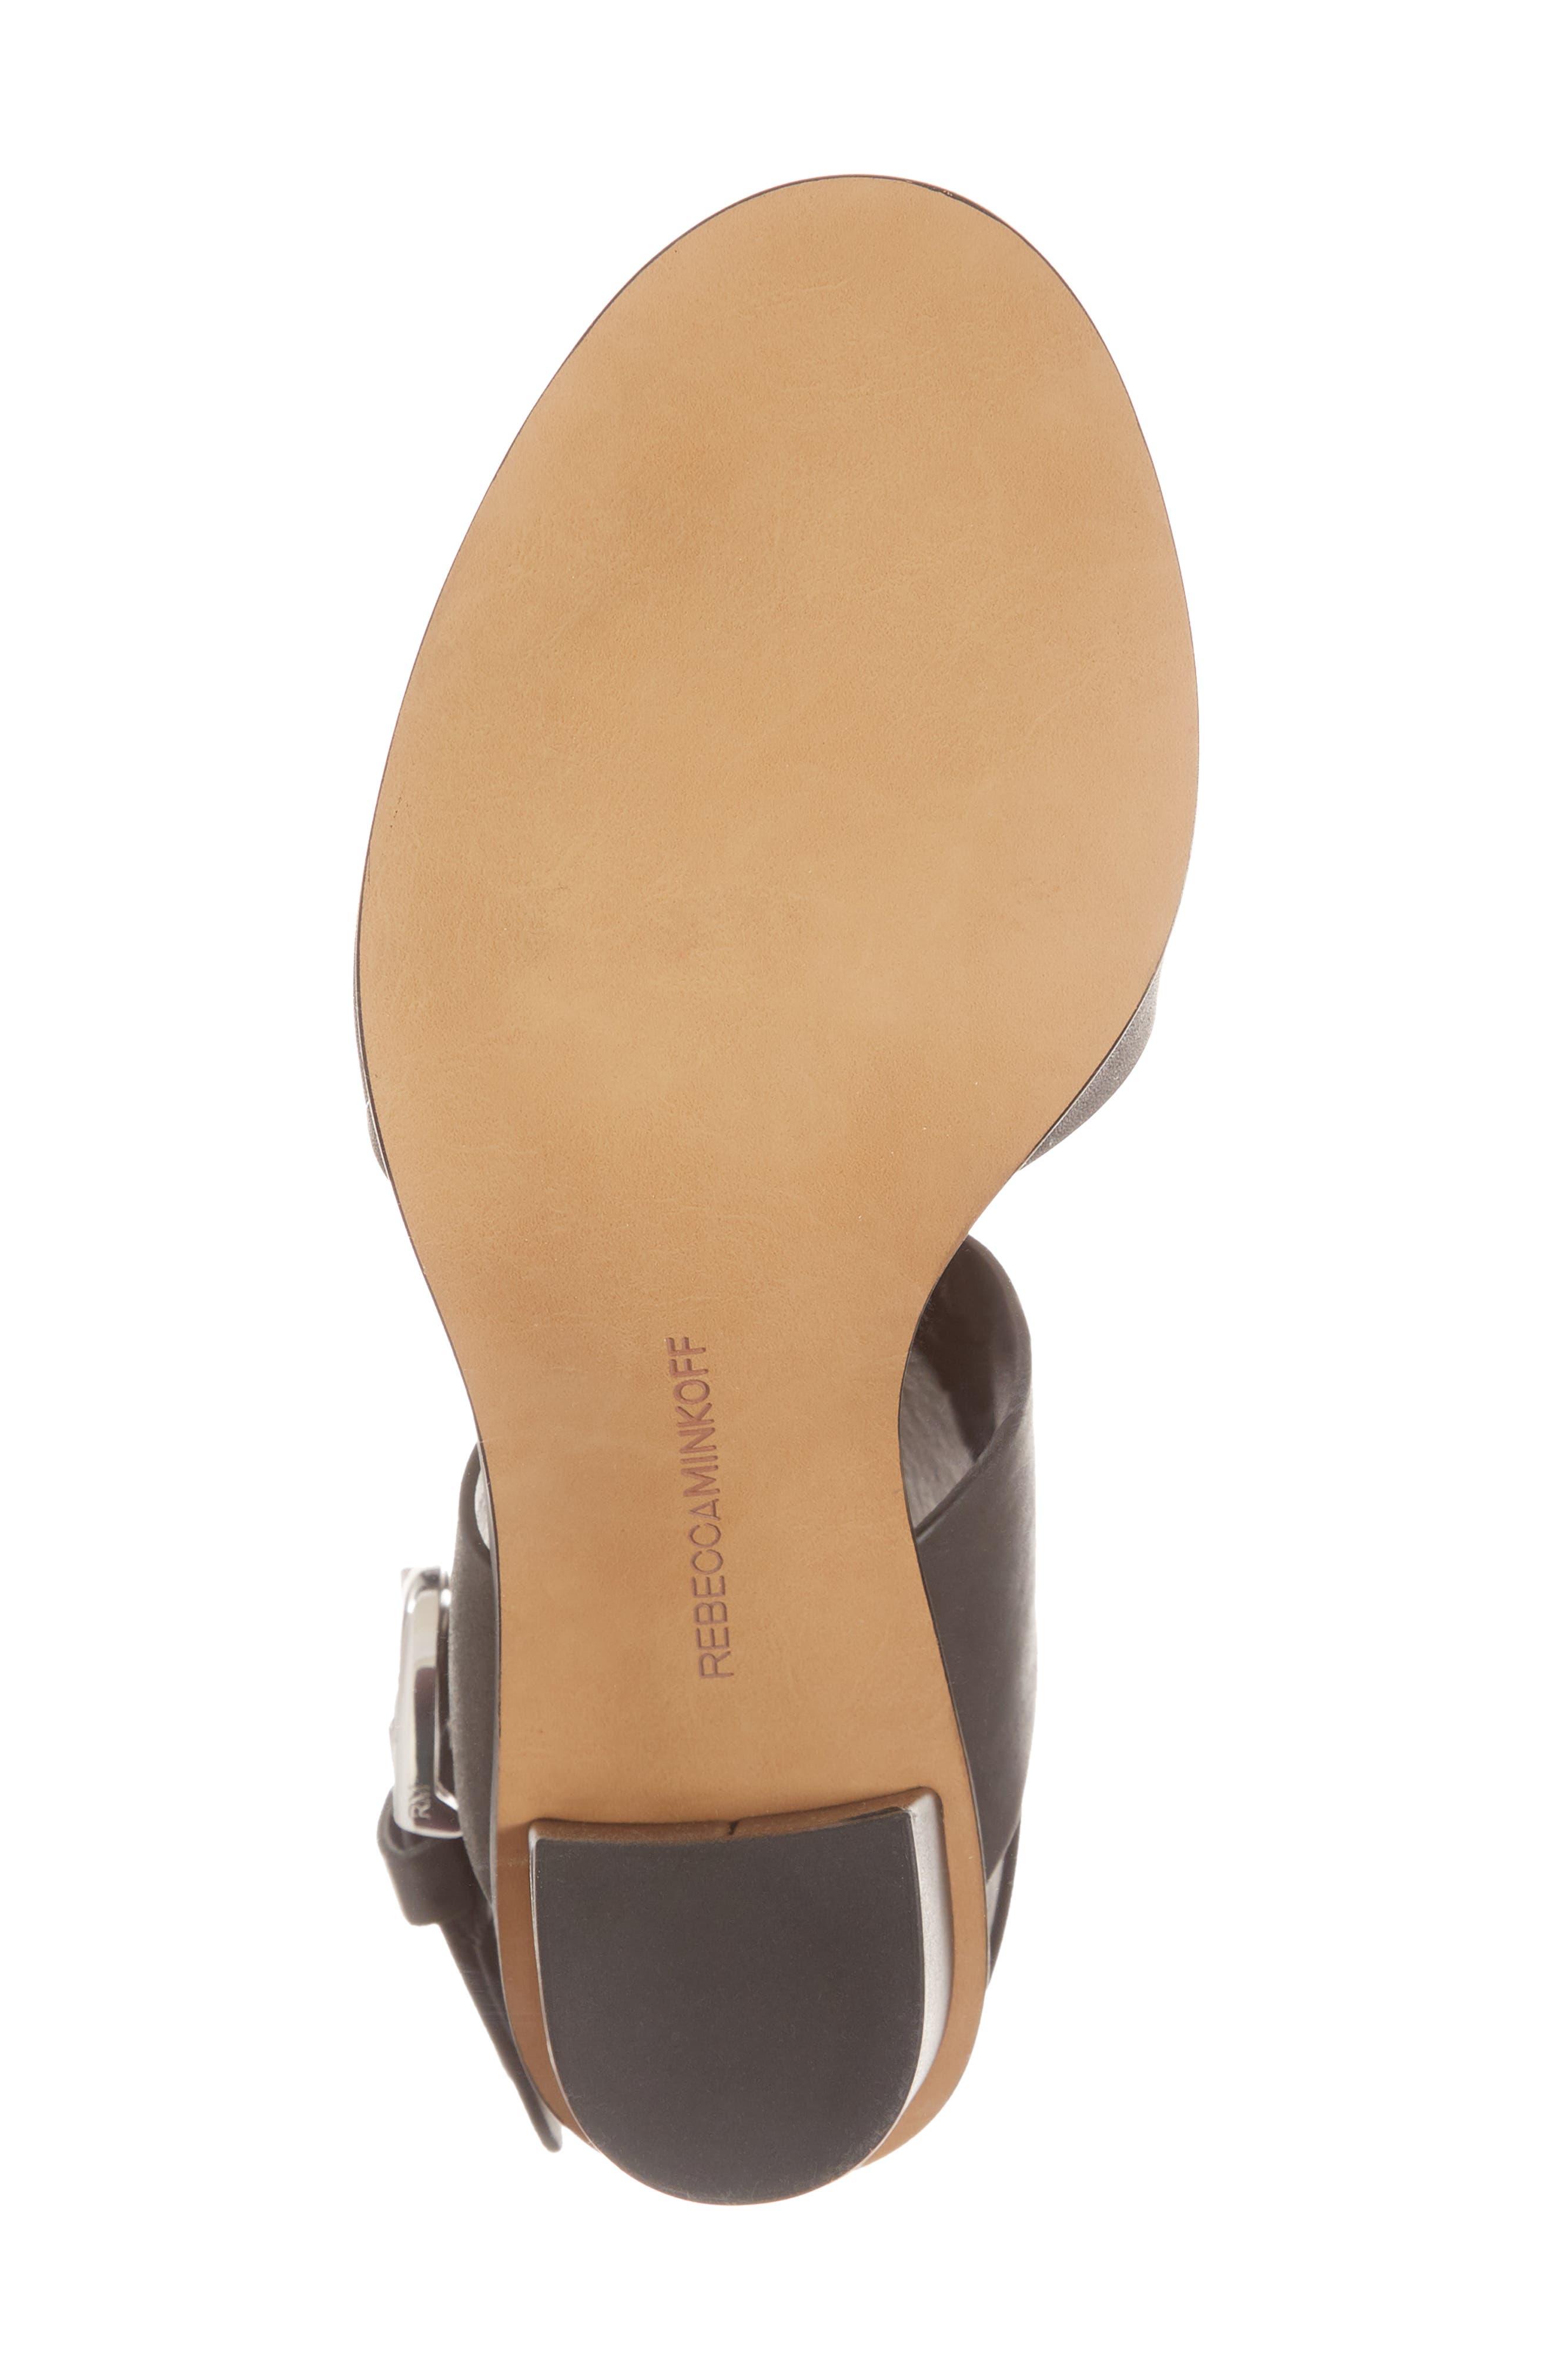 Valaree Sandal,                             Alternate thumbnail 6, color,                             Black Leather